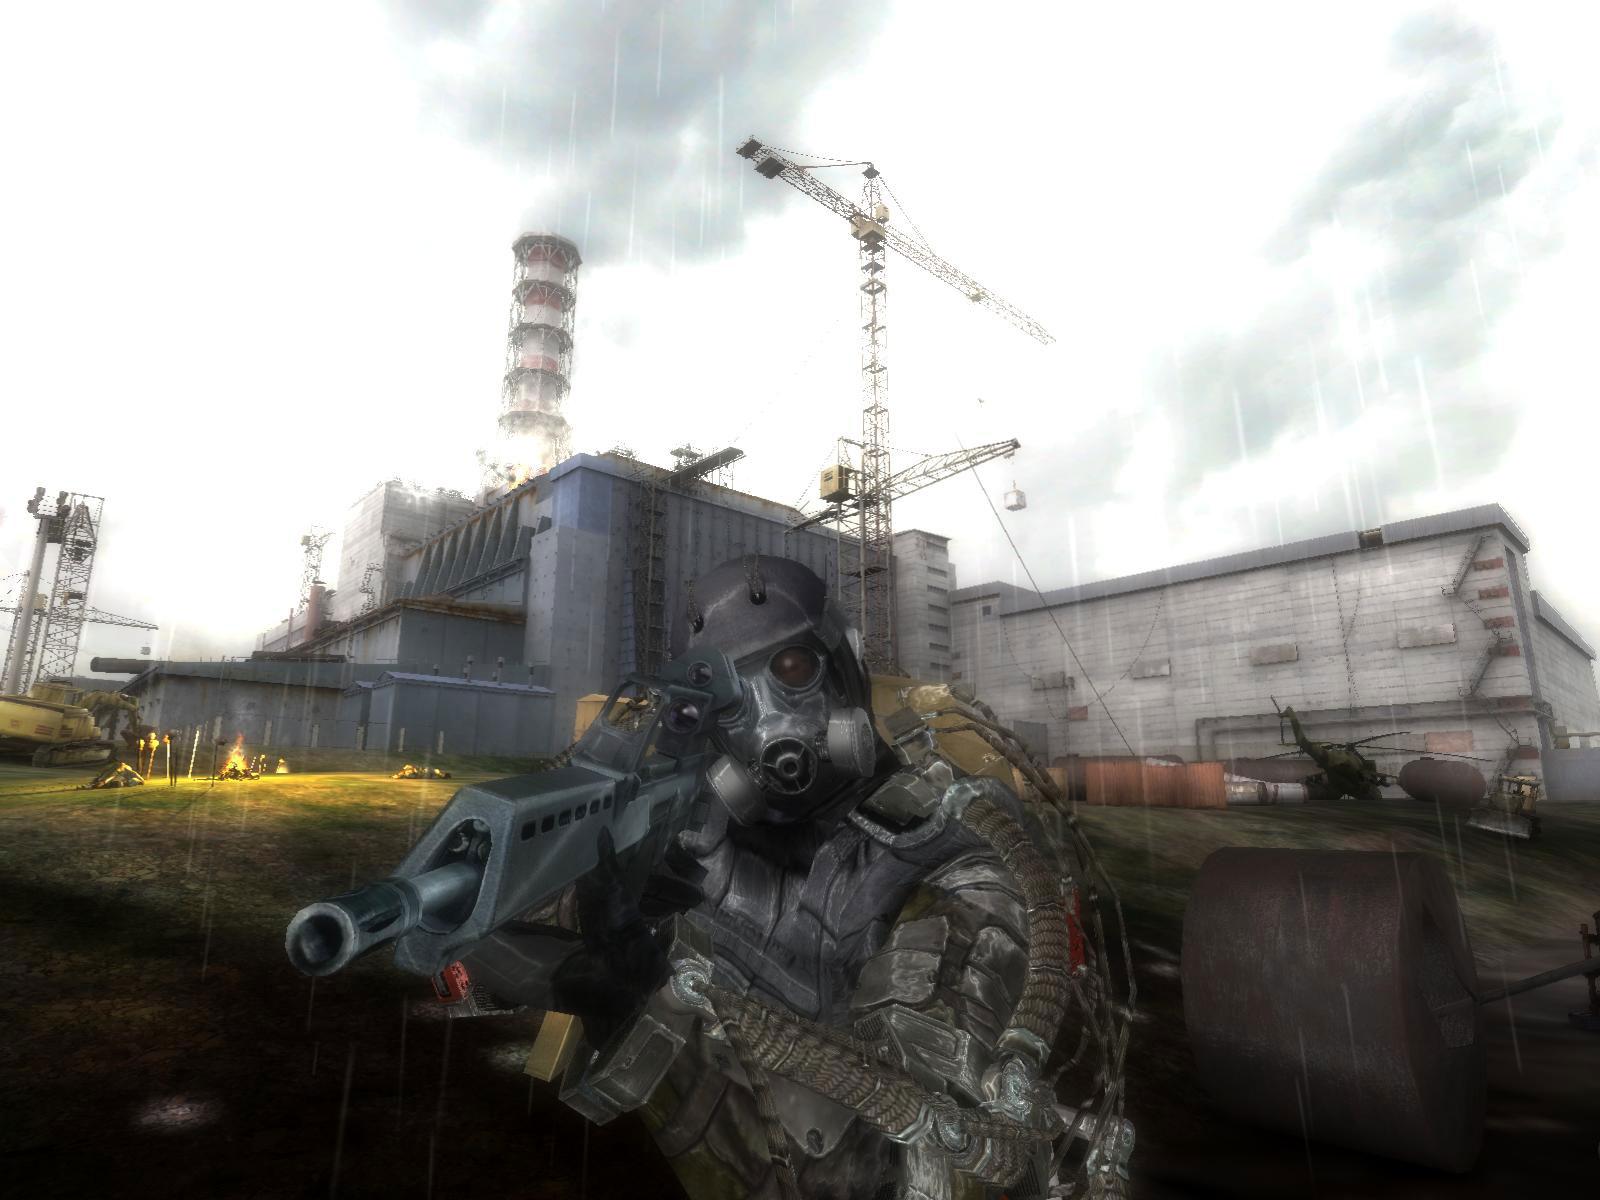 Stalker-shadow-of-chernobyl-20060615035418802.